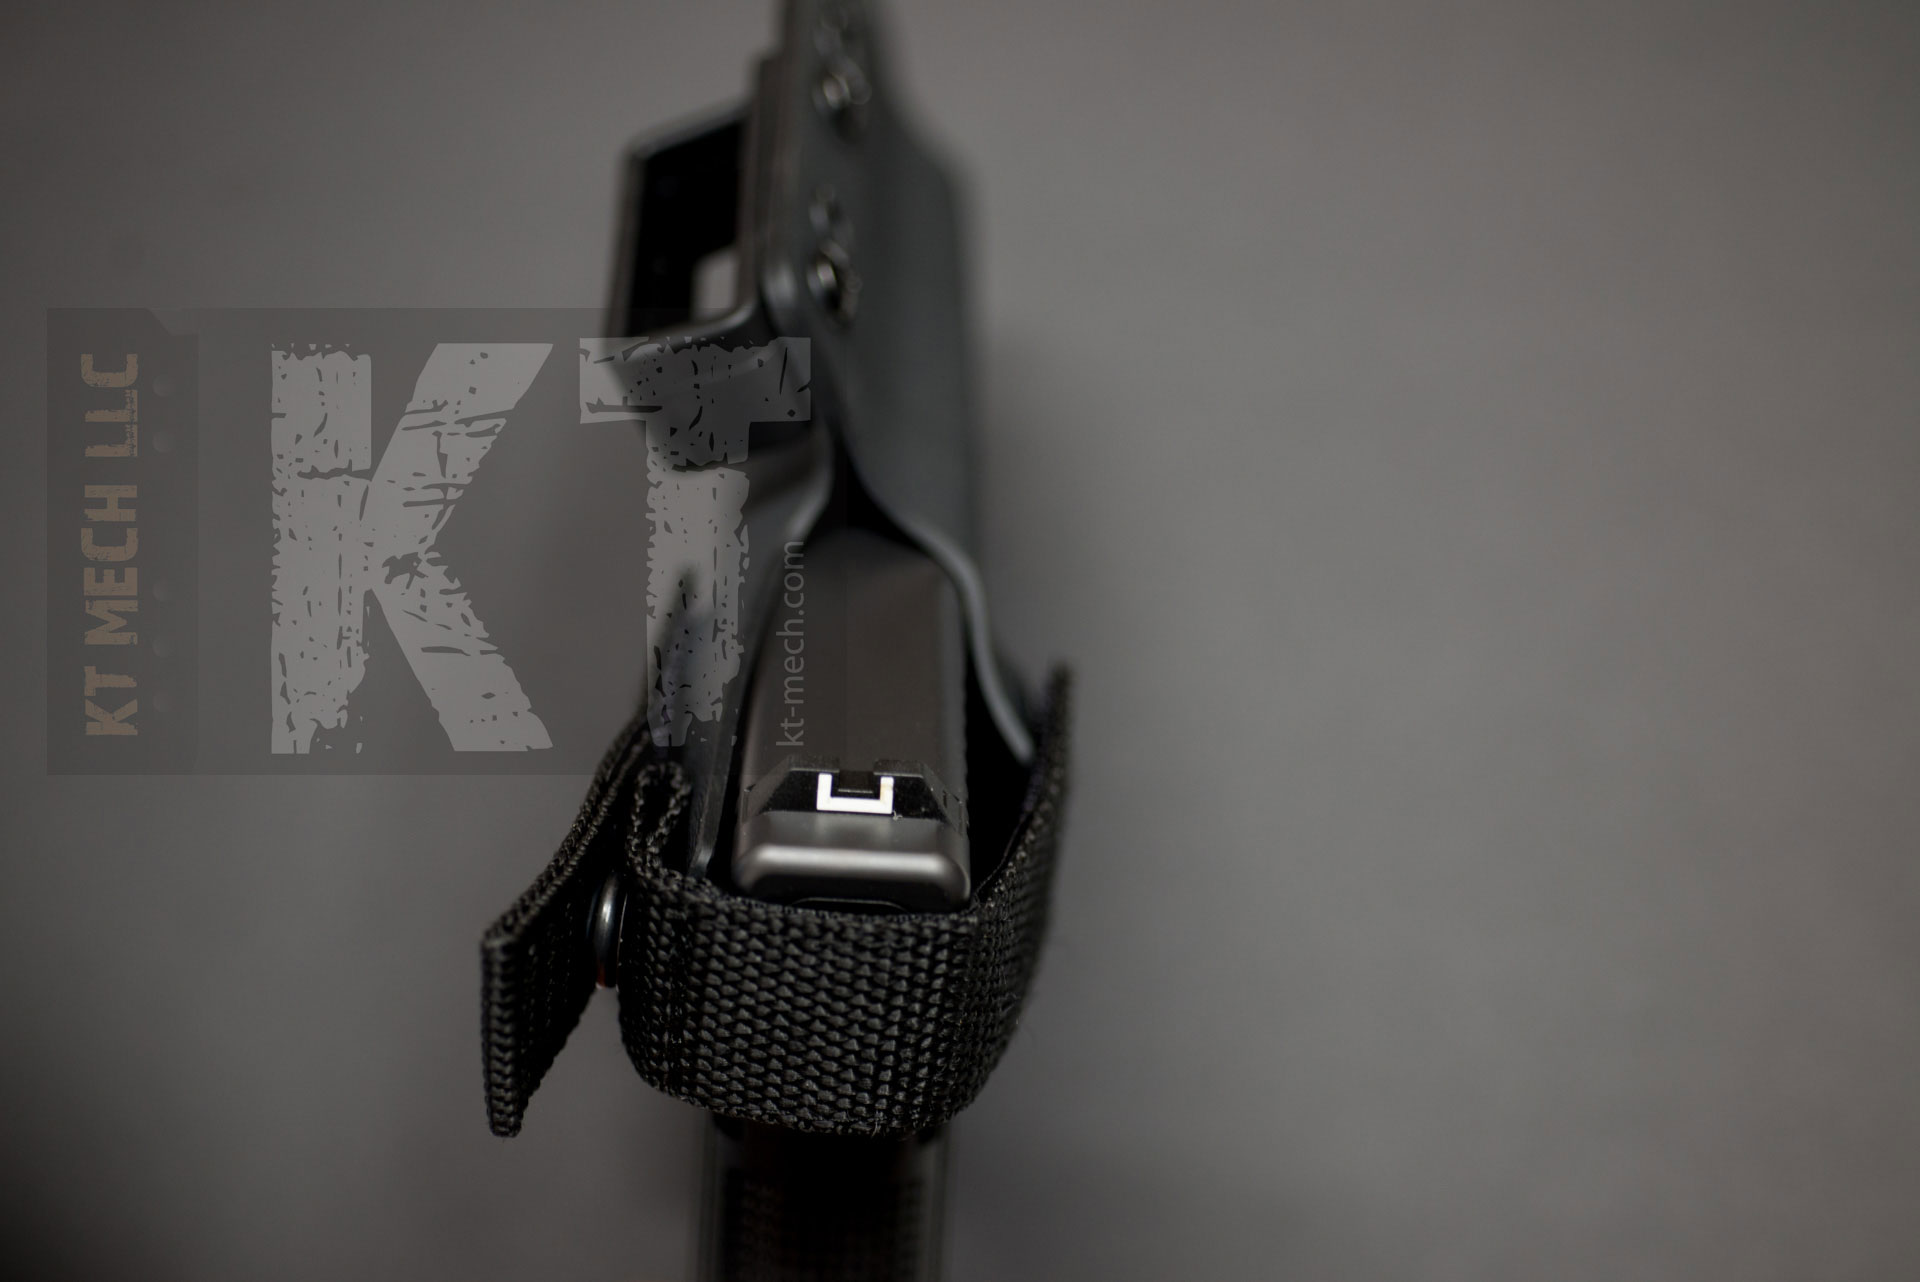 KT MECH LLC - thumb break